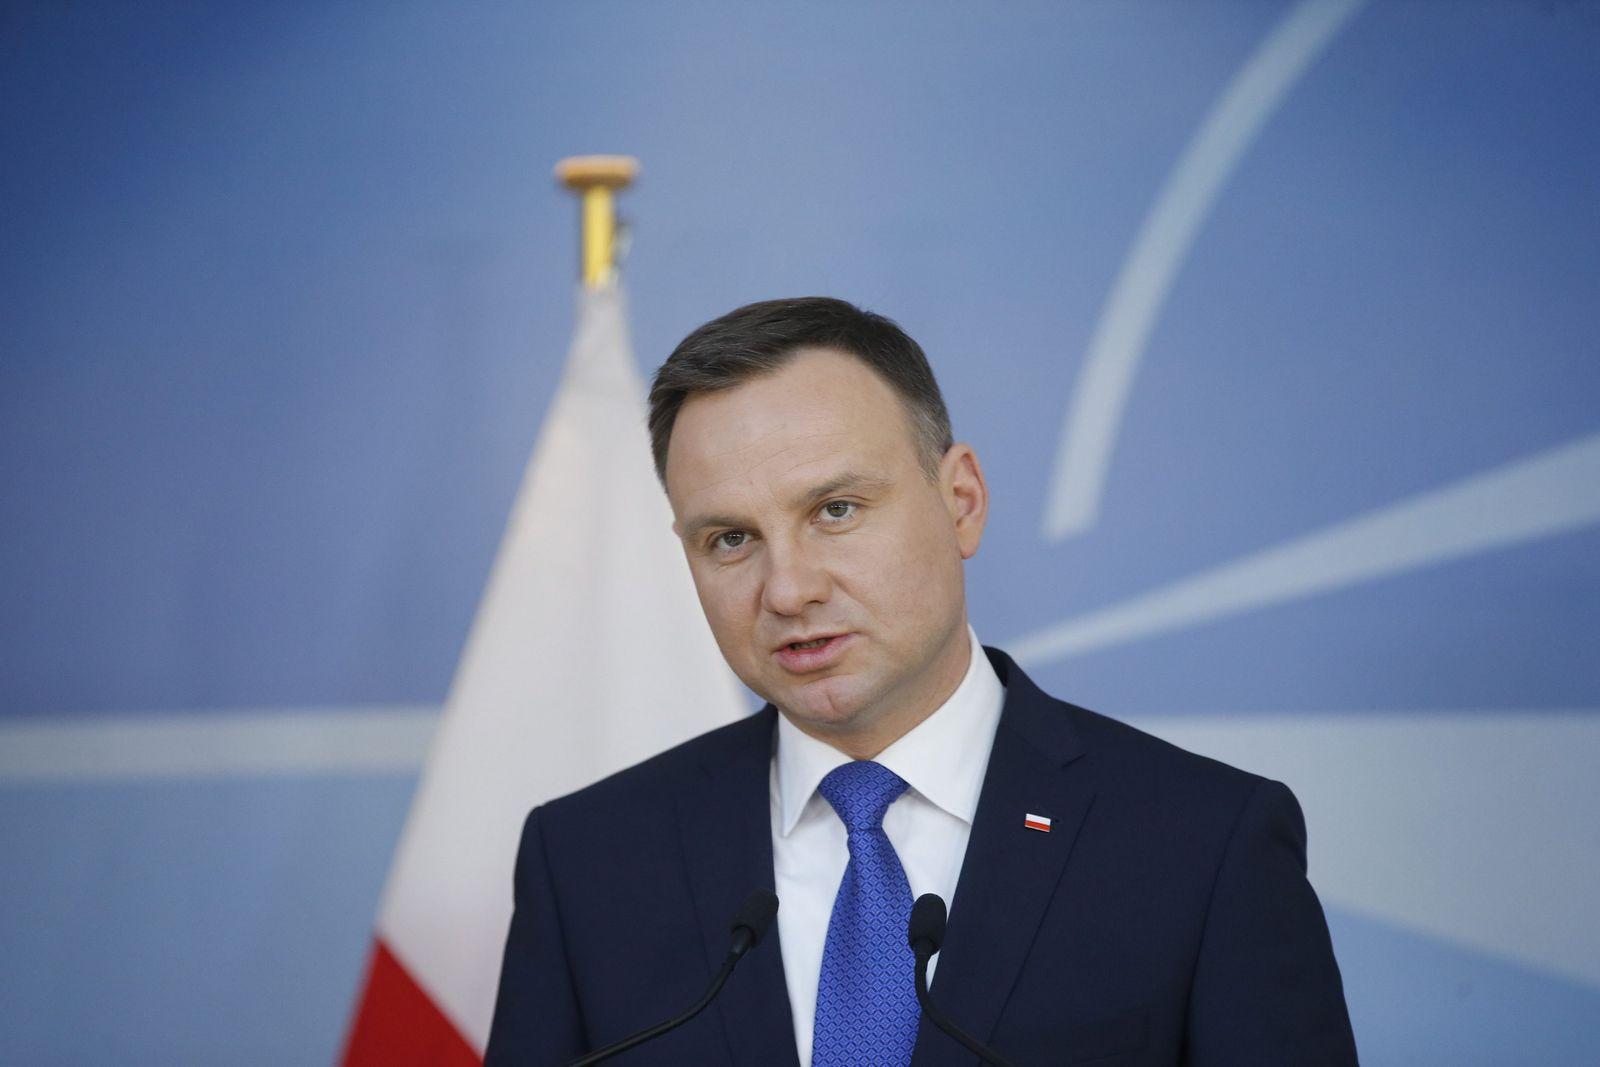 Polish President Andrzej Duda is welcomed by NATO Secretary Gener